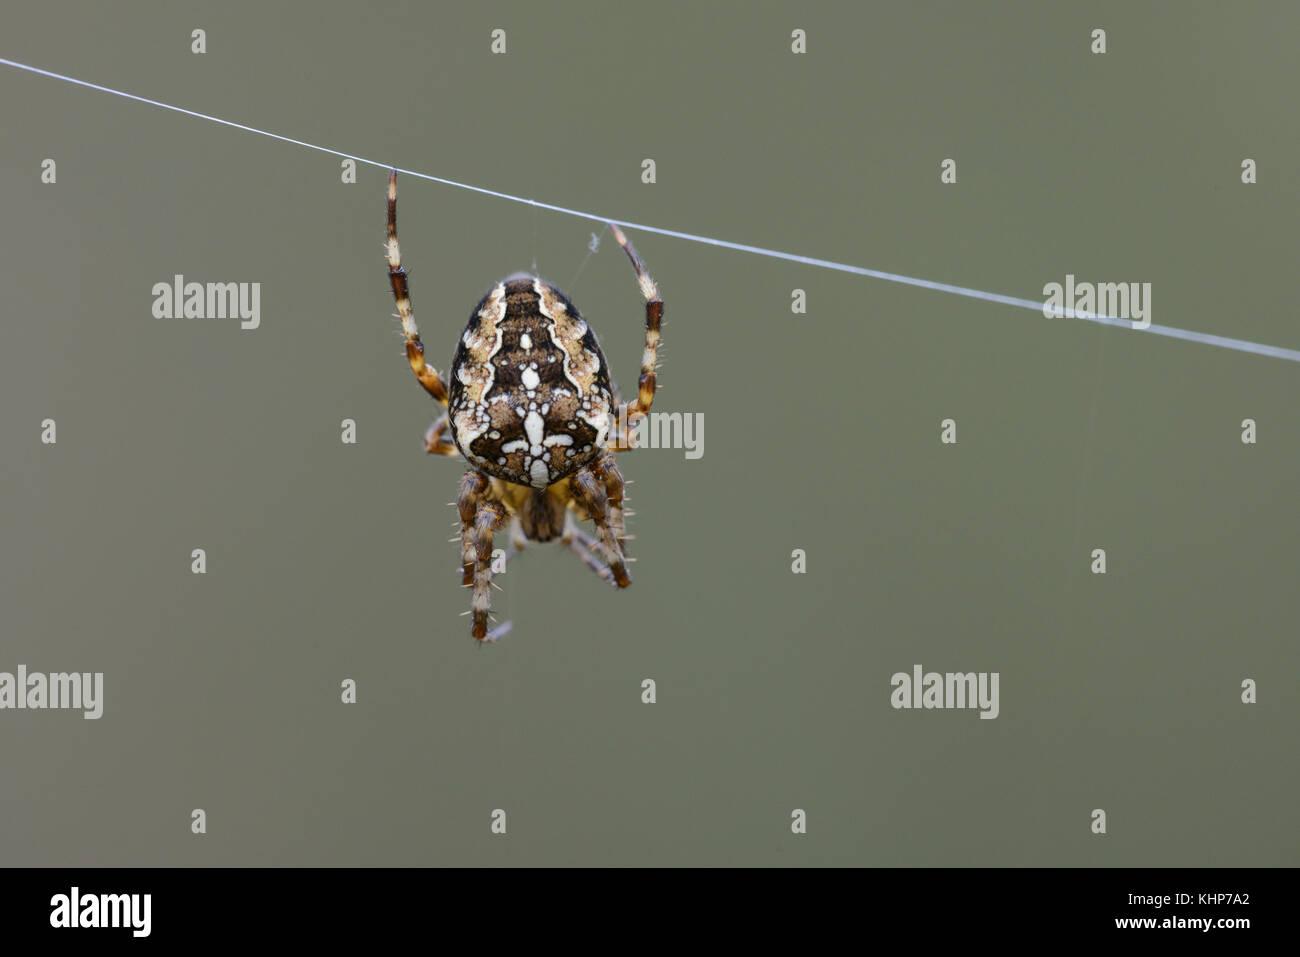 Garden Spider (web), on single strand of web - Stock Image